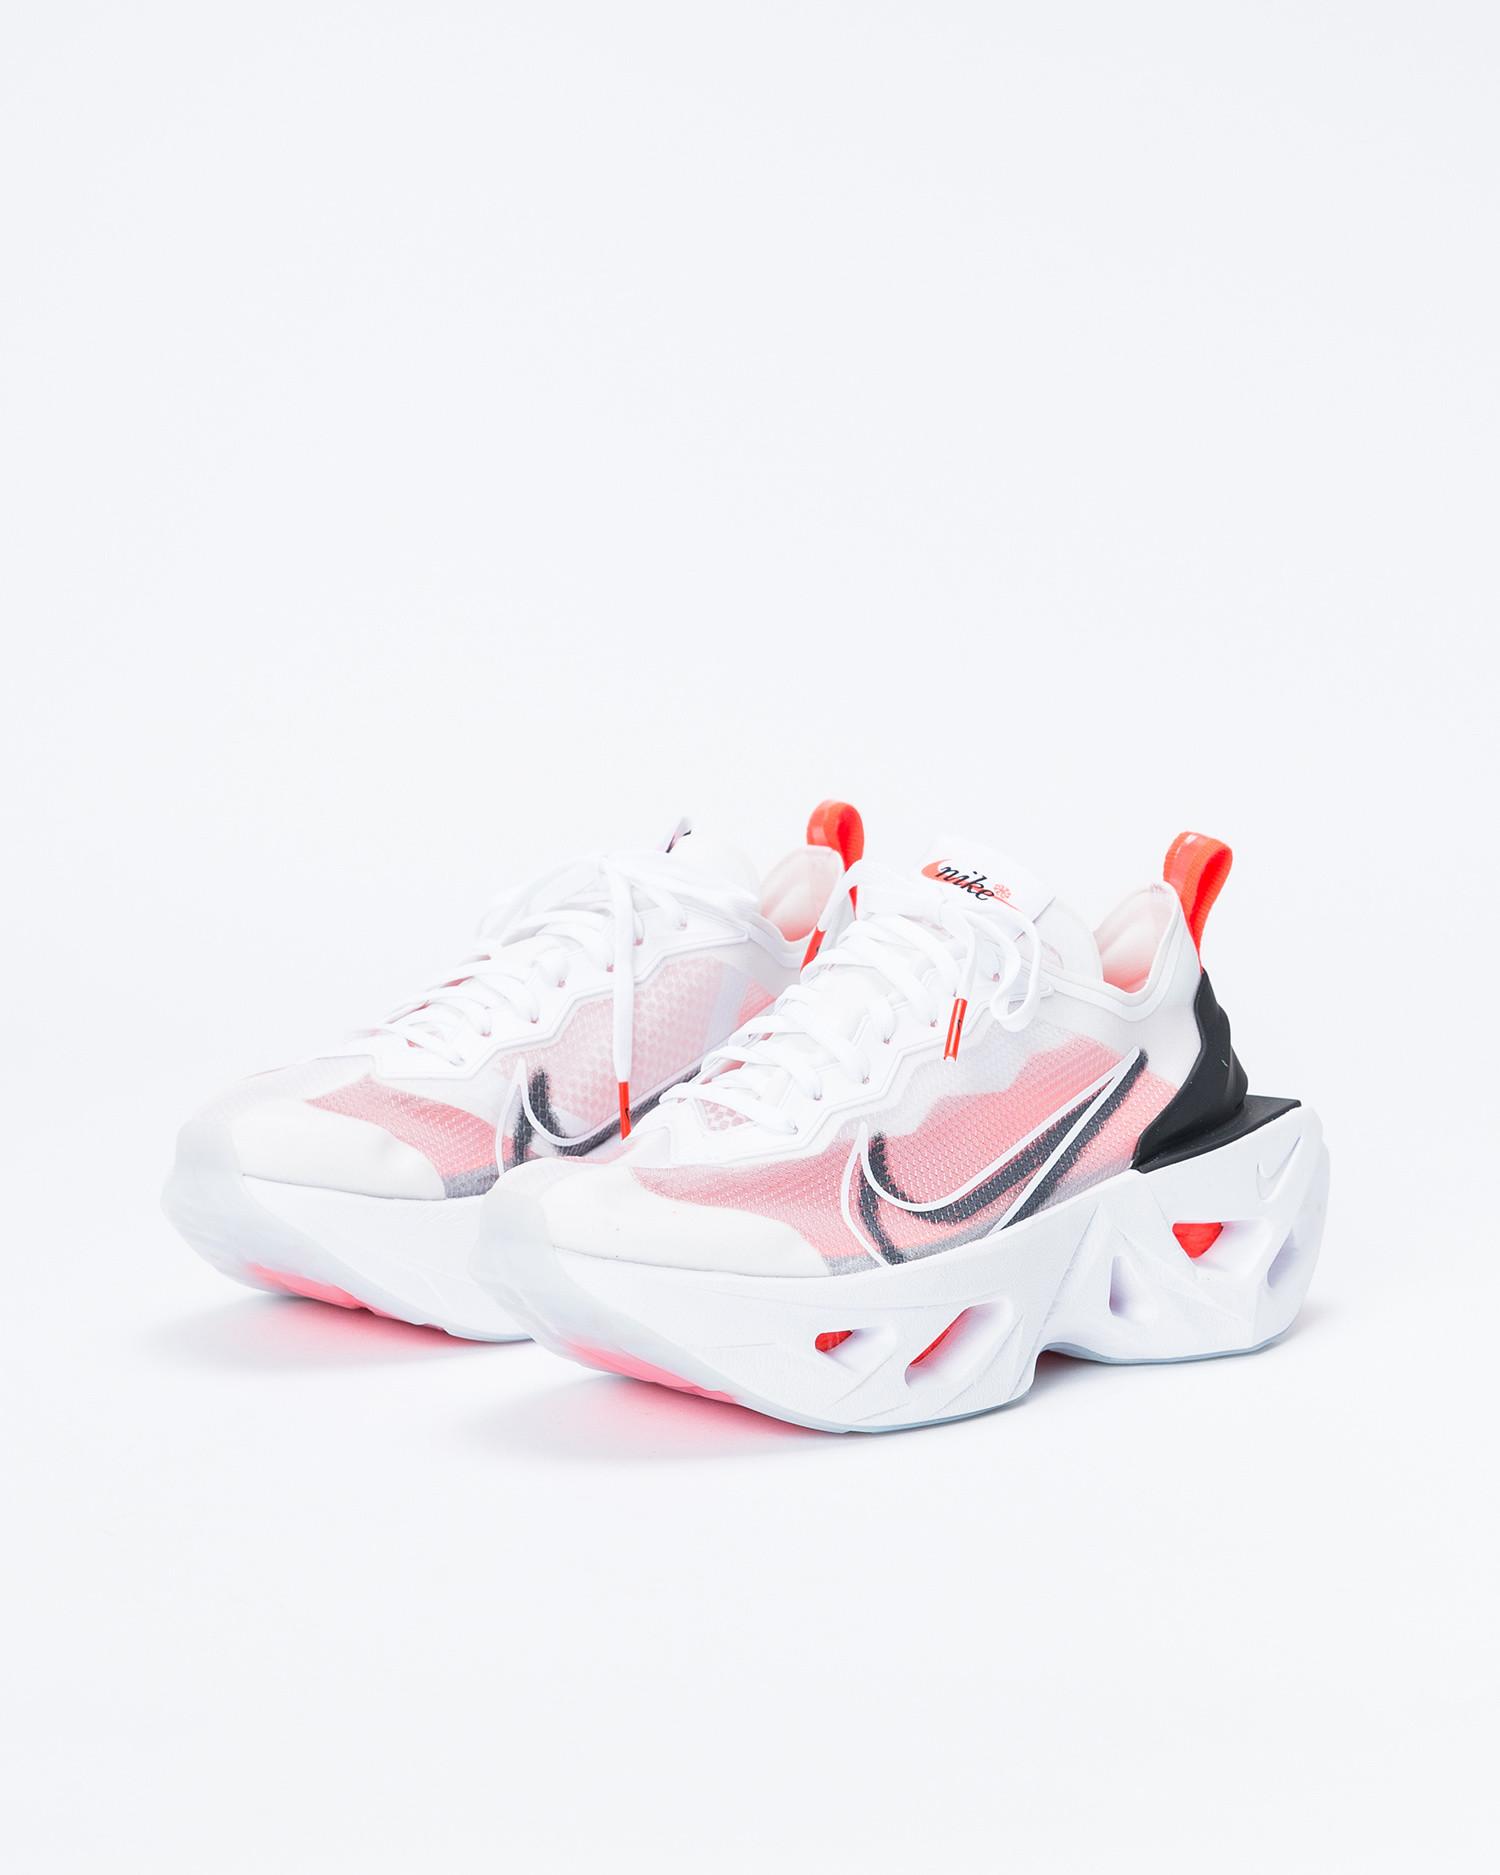 Nike Women  zoom x vista grind White/black-bright crimson